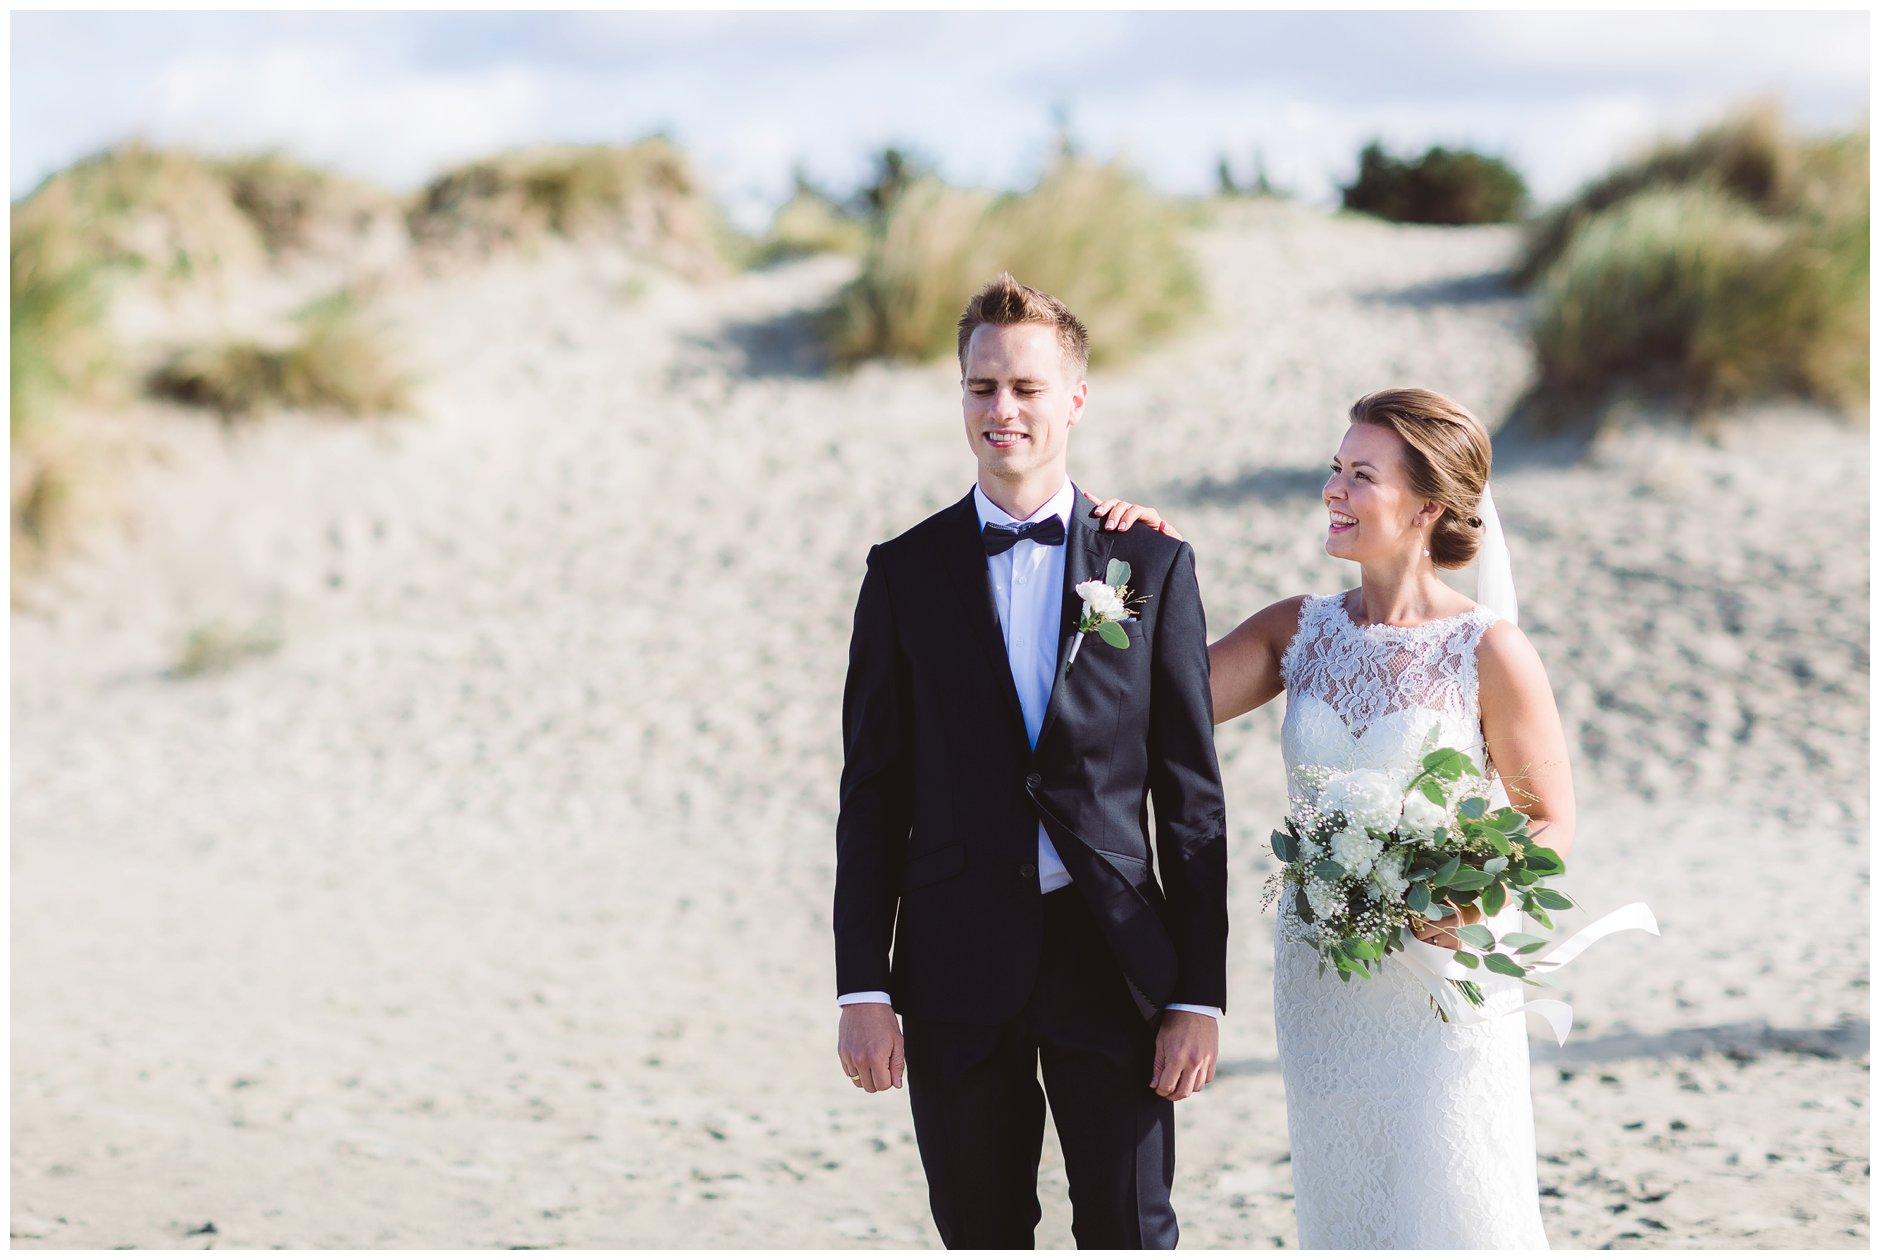 Bryllup First look Jæren Sola stranded